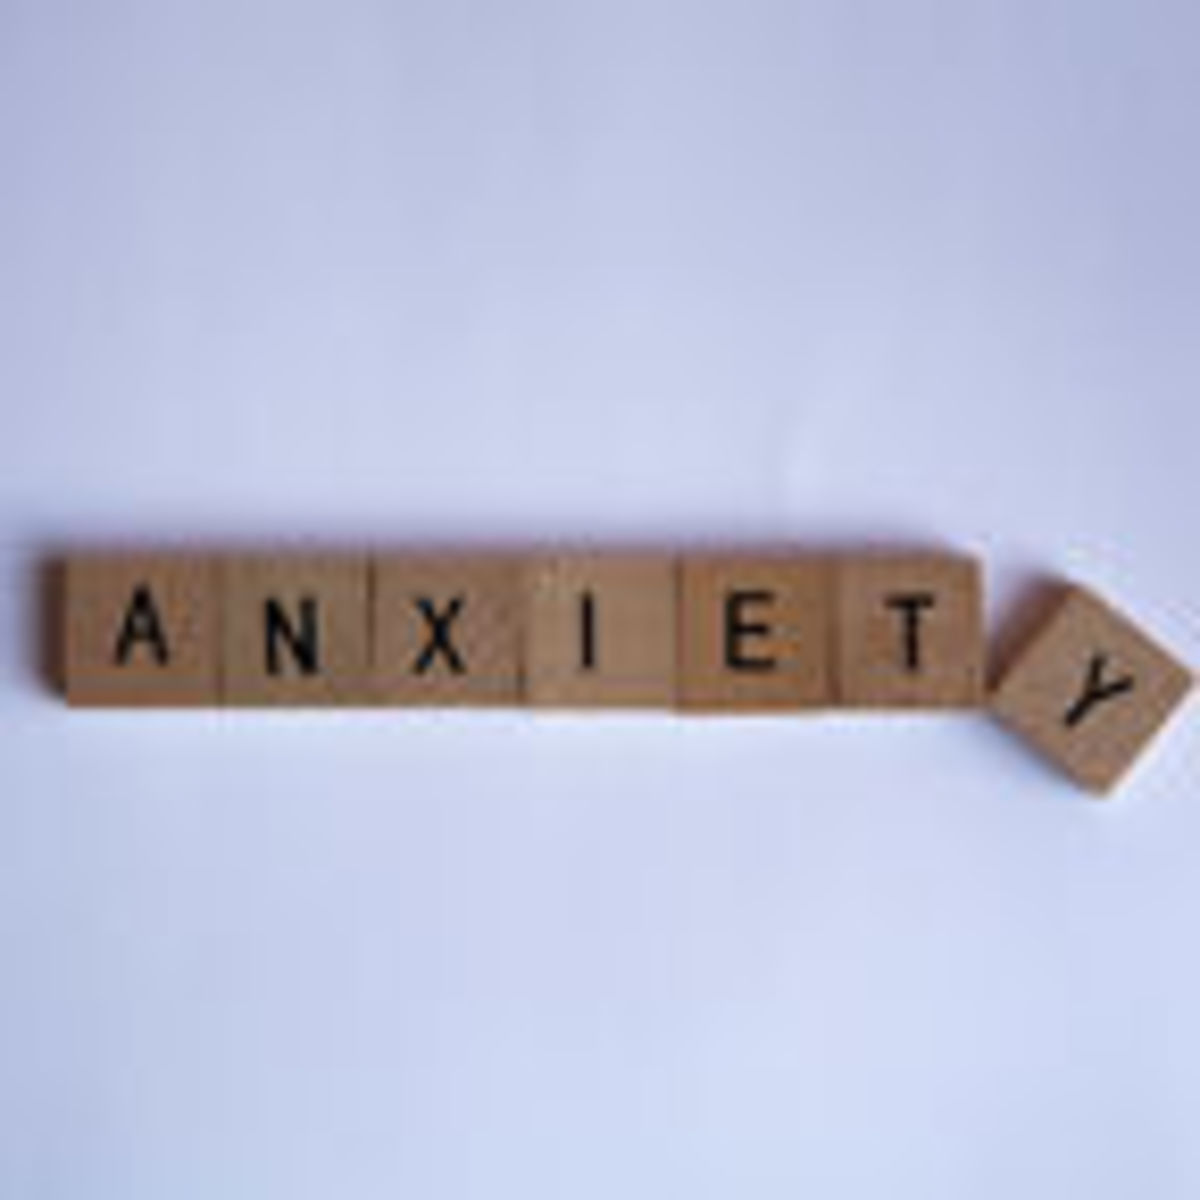 Why We Feel Anxious